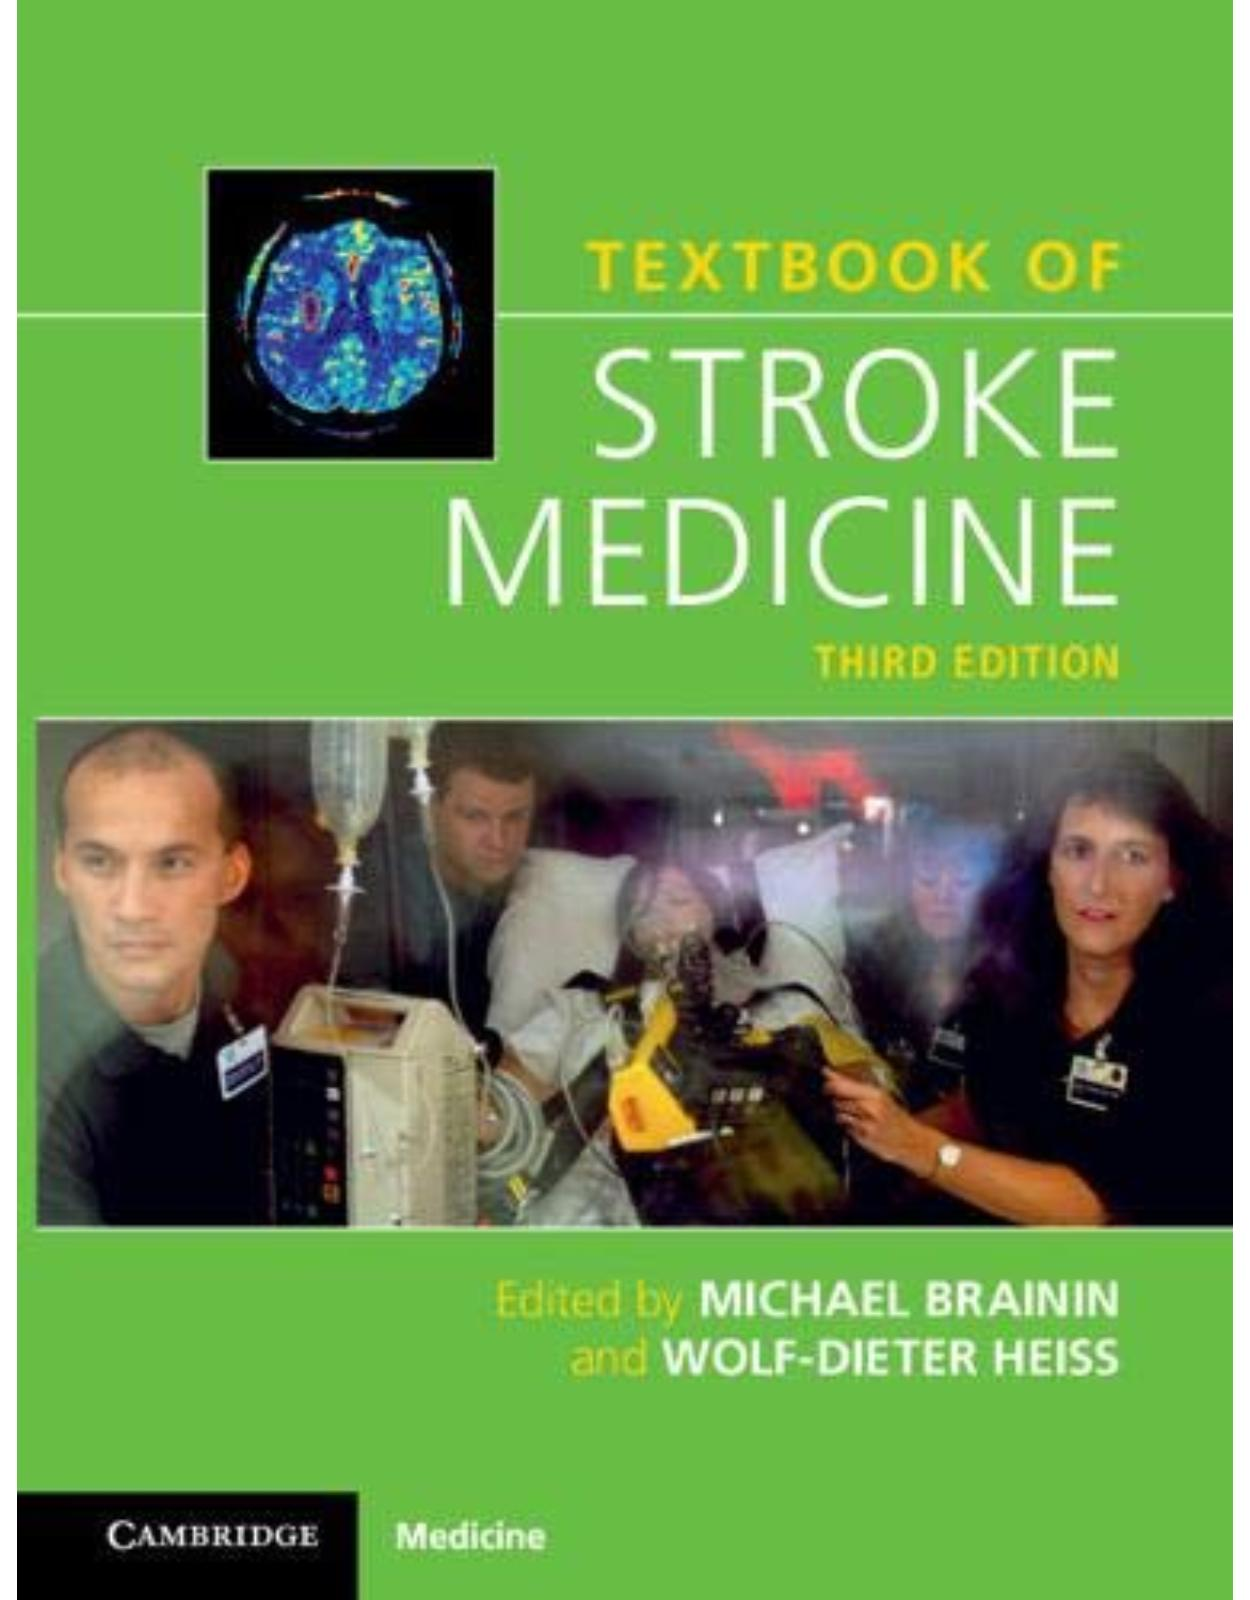 Textbook of Stroke Medicine. 3rd Edition